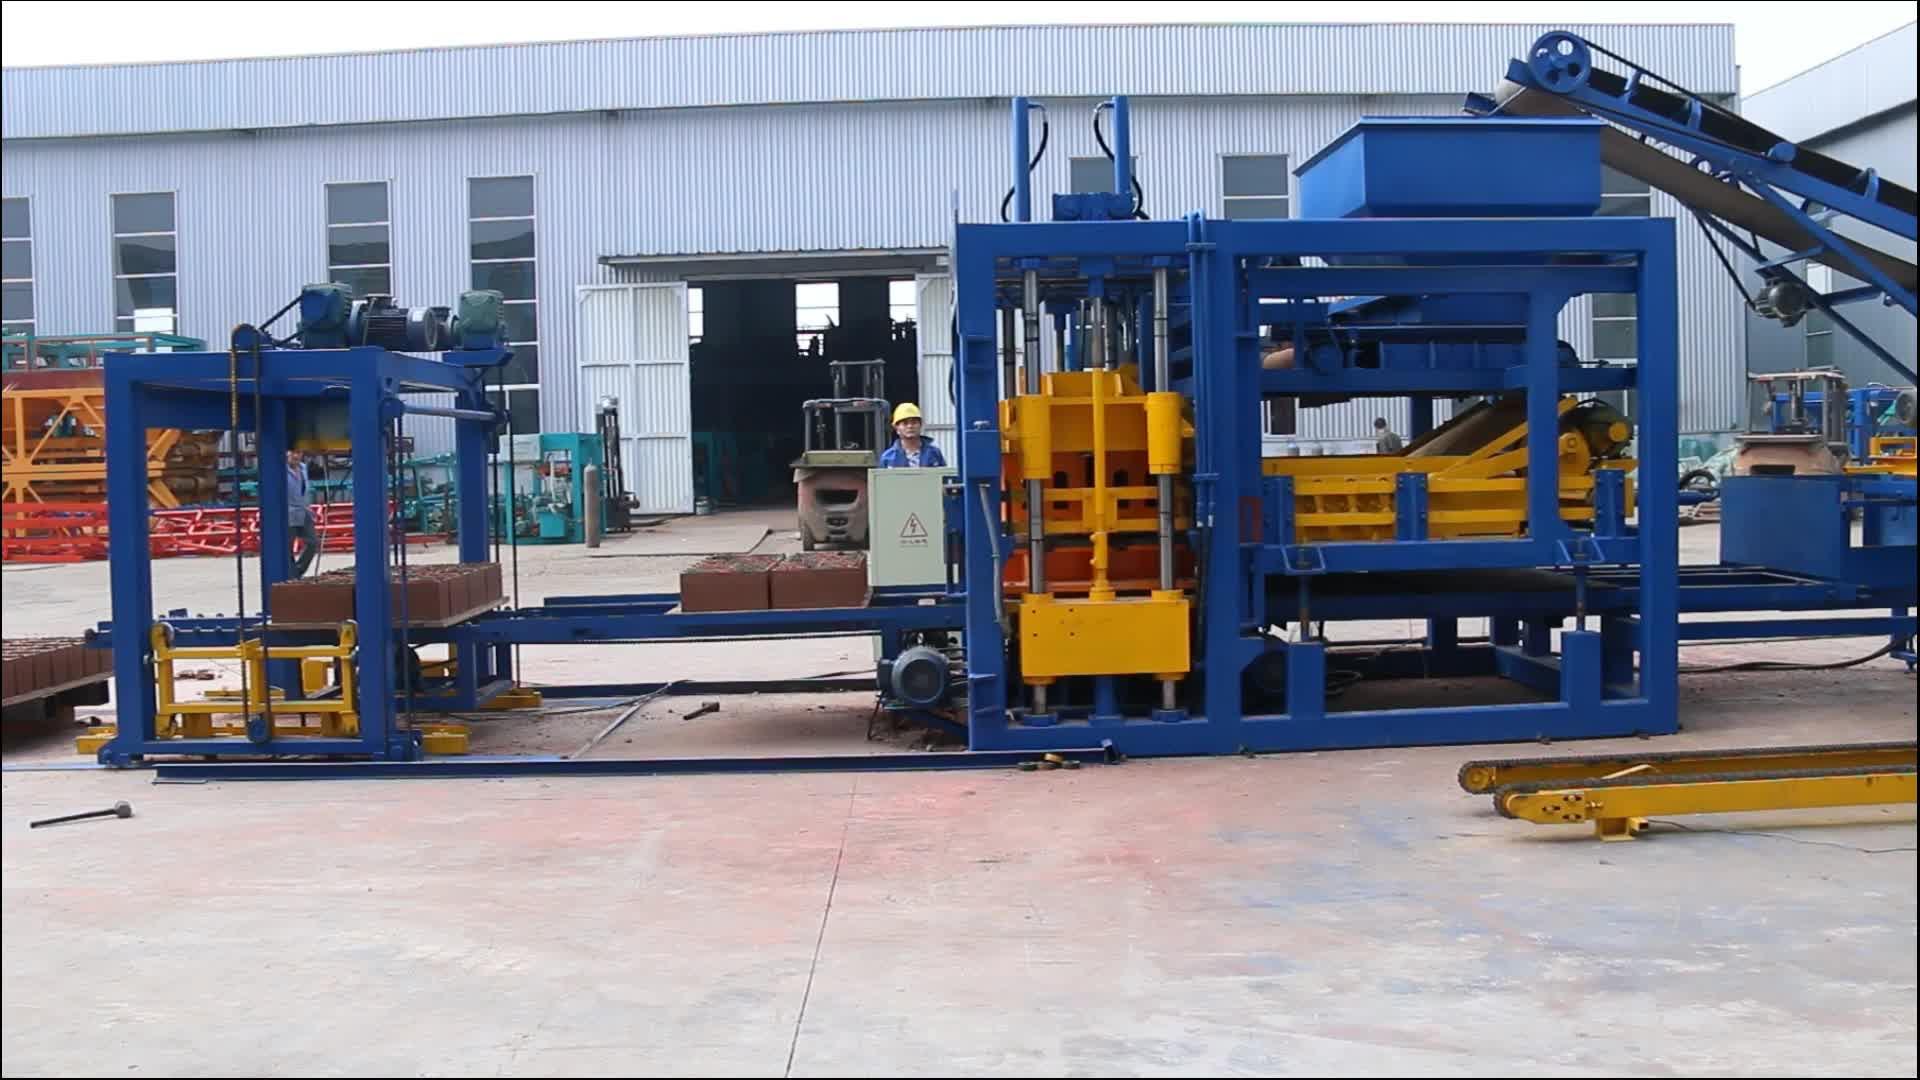 QT10-15 otomatik çimento beton blok yapma makinesi fiyat tuğla makinesi